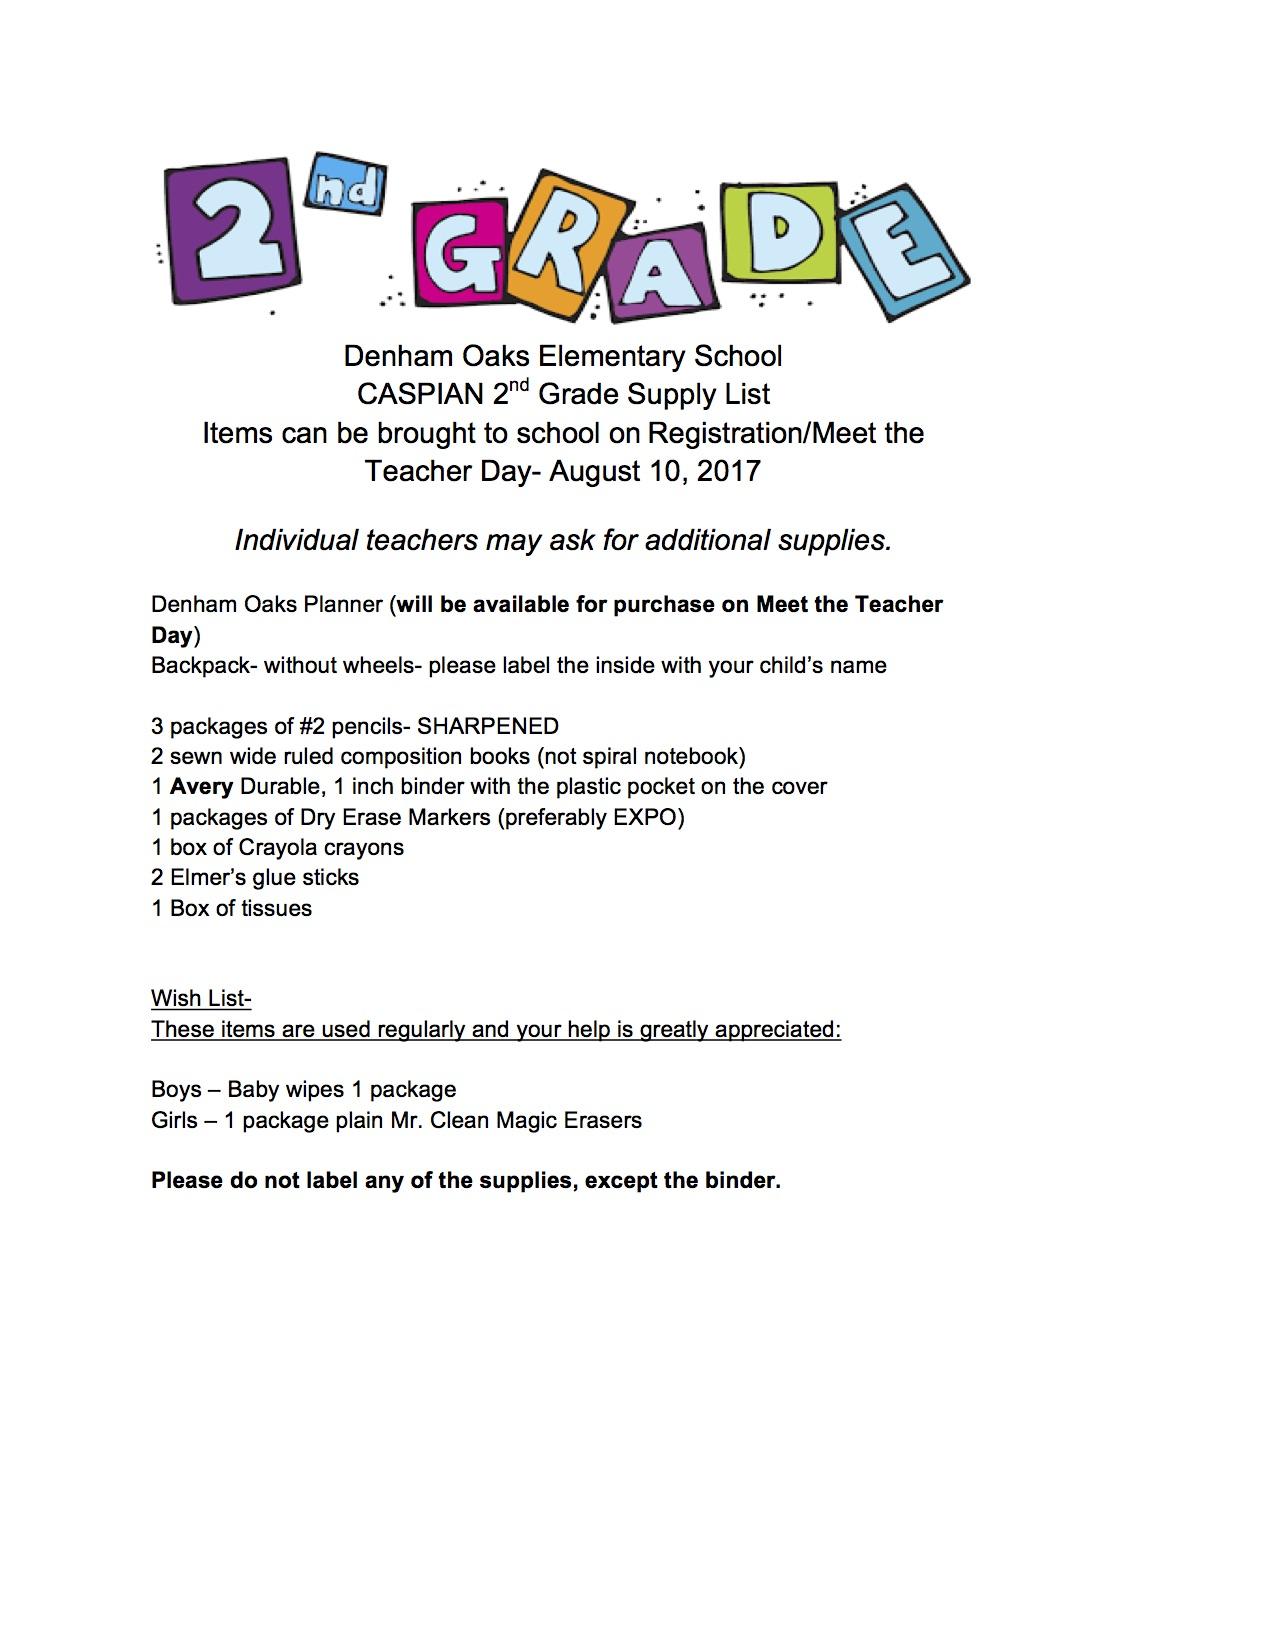 School Supply List For Teachers Lexutk